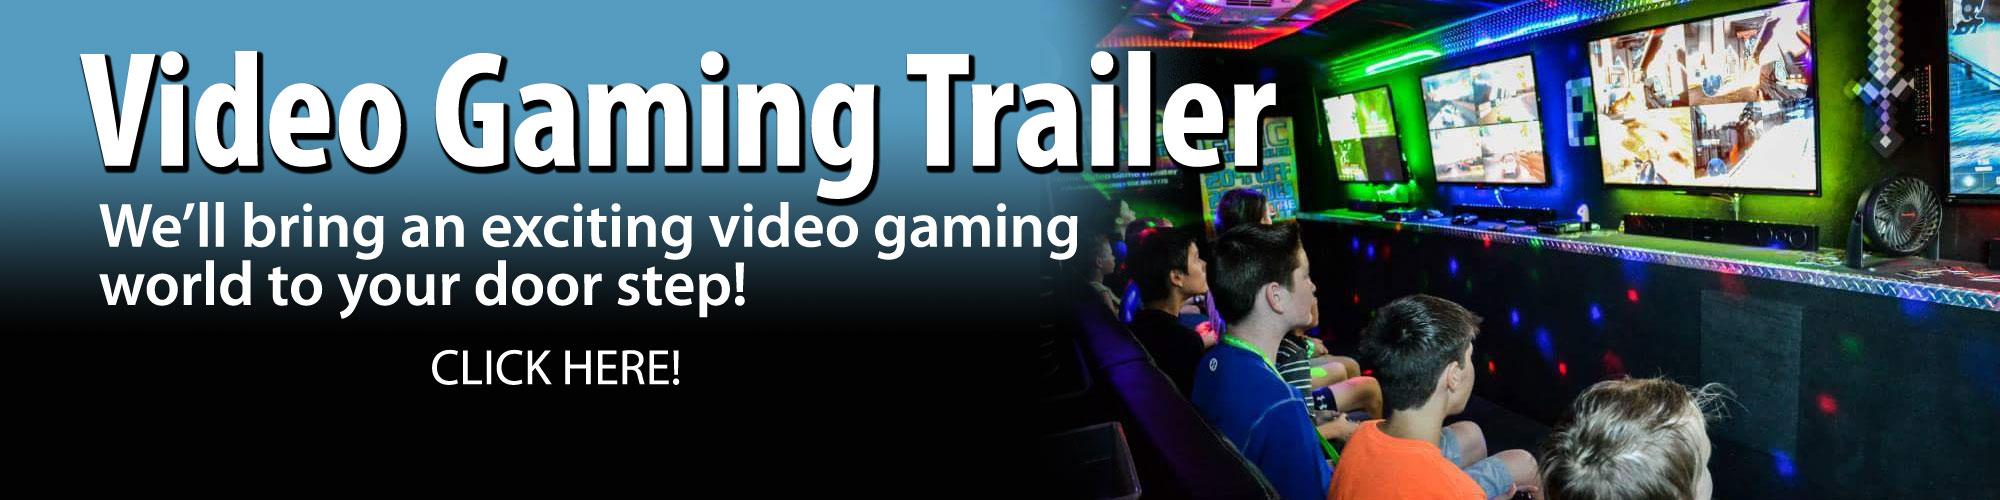 Video Game Trailer Rental